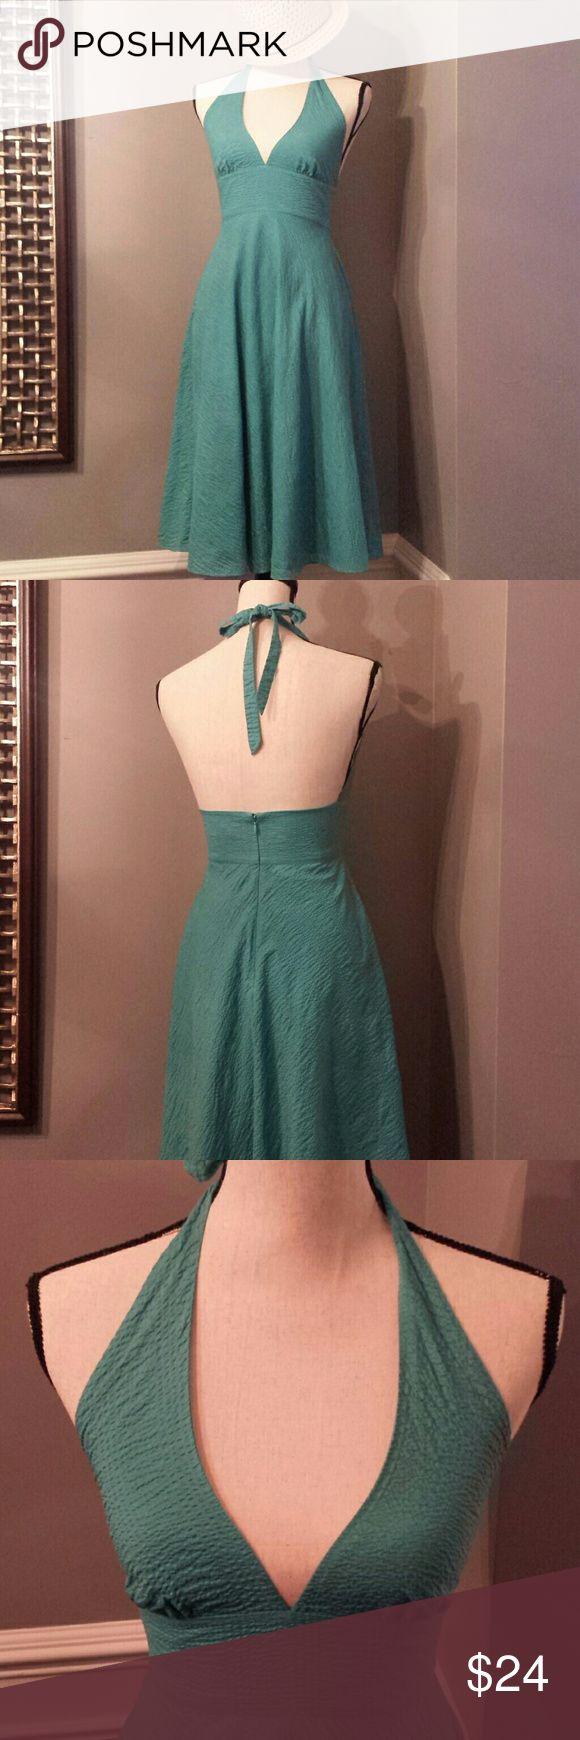 "J. Crew Seersucker Sundress Beautiful Aqua Color Perfect for a summer wedding Halter Top Deep V-Neck  26"" from natural waist to bottom  Size 2 J. Crew Dresses"